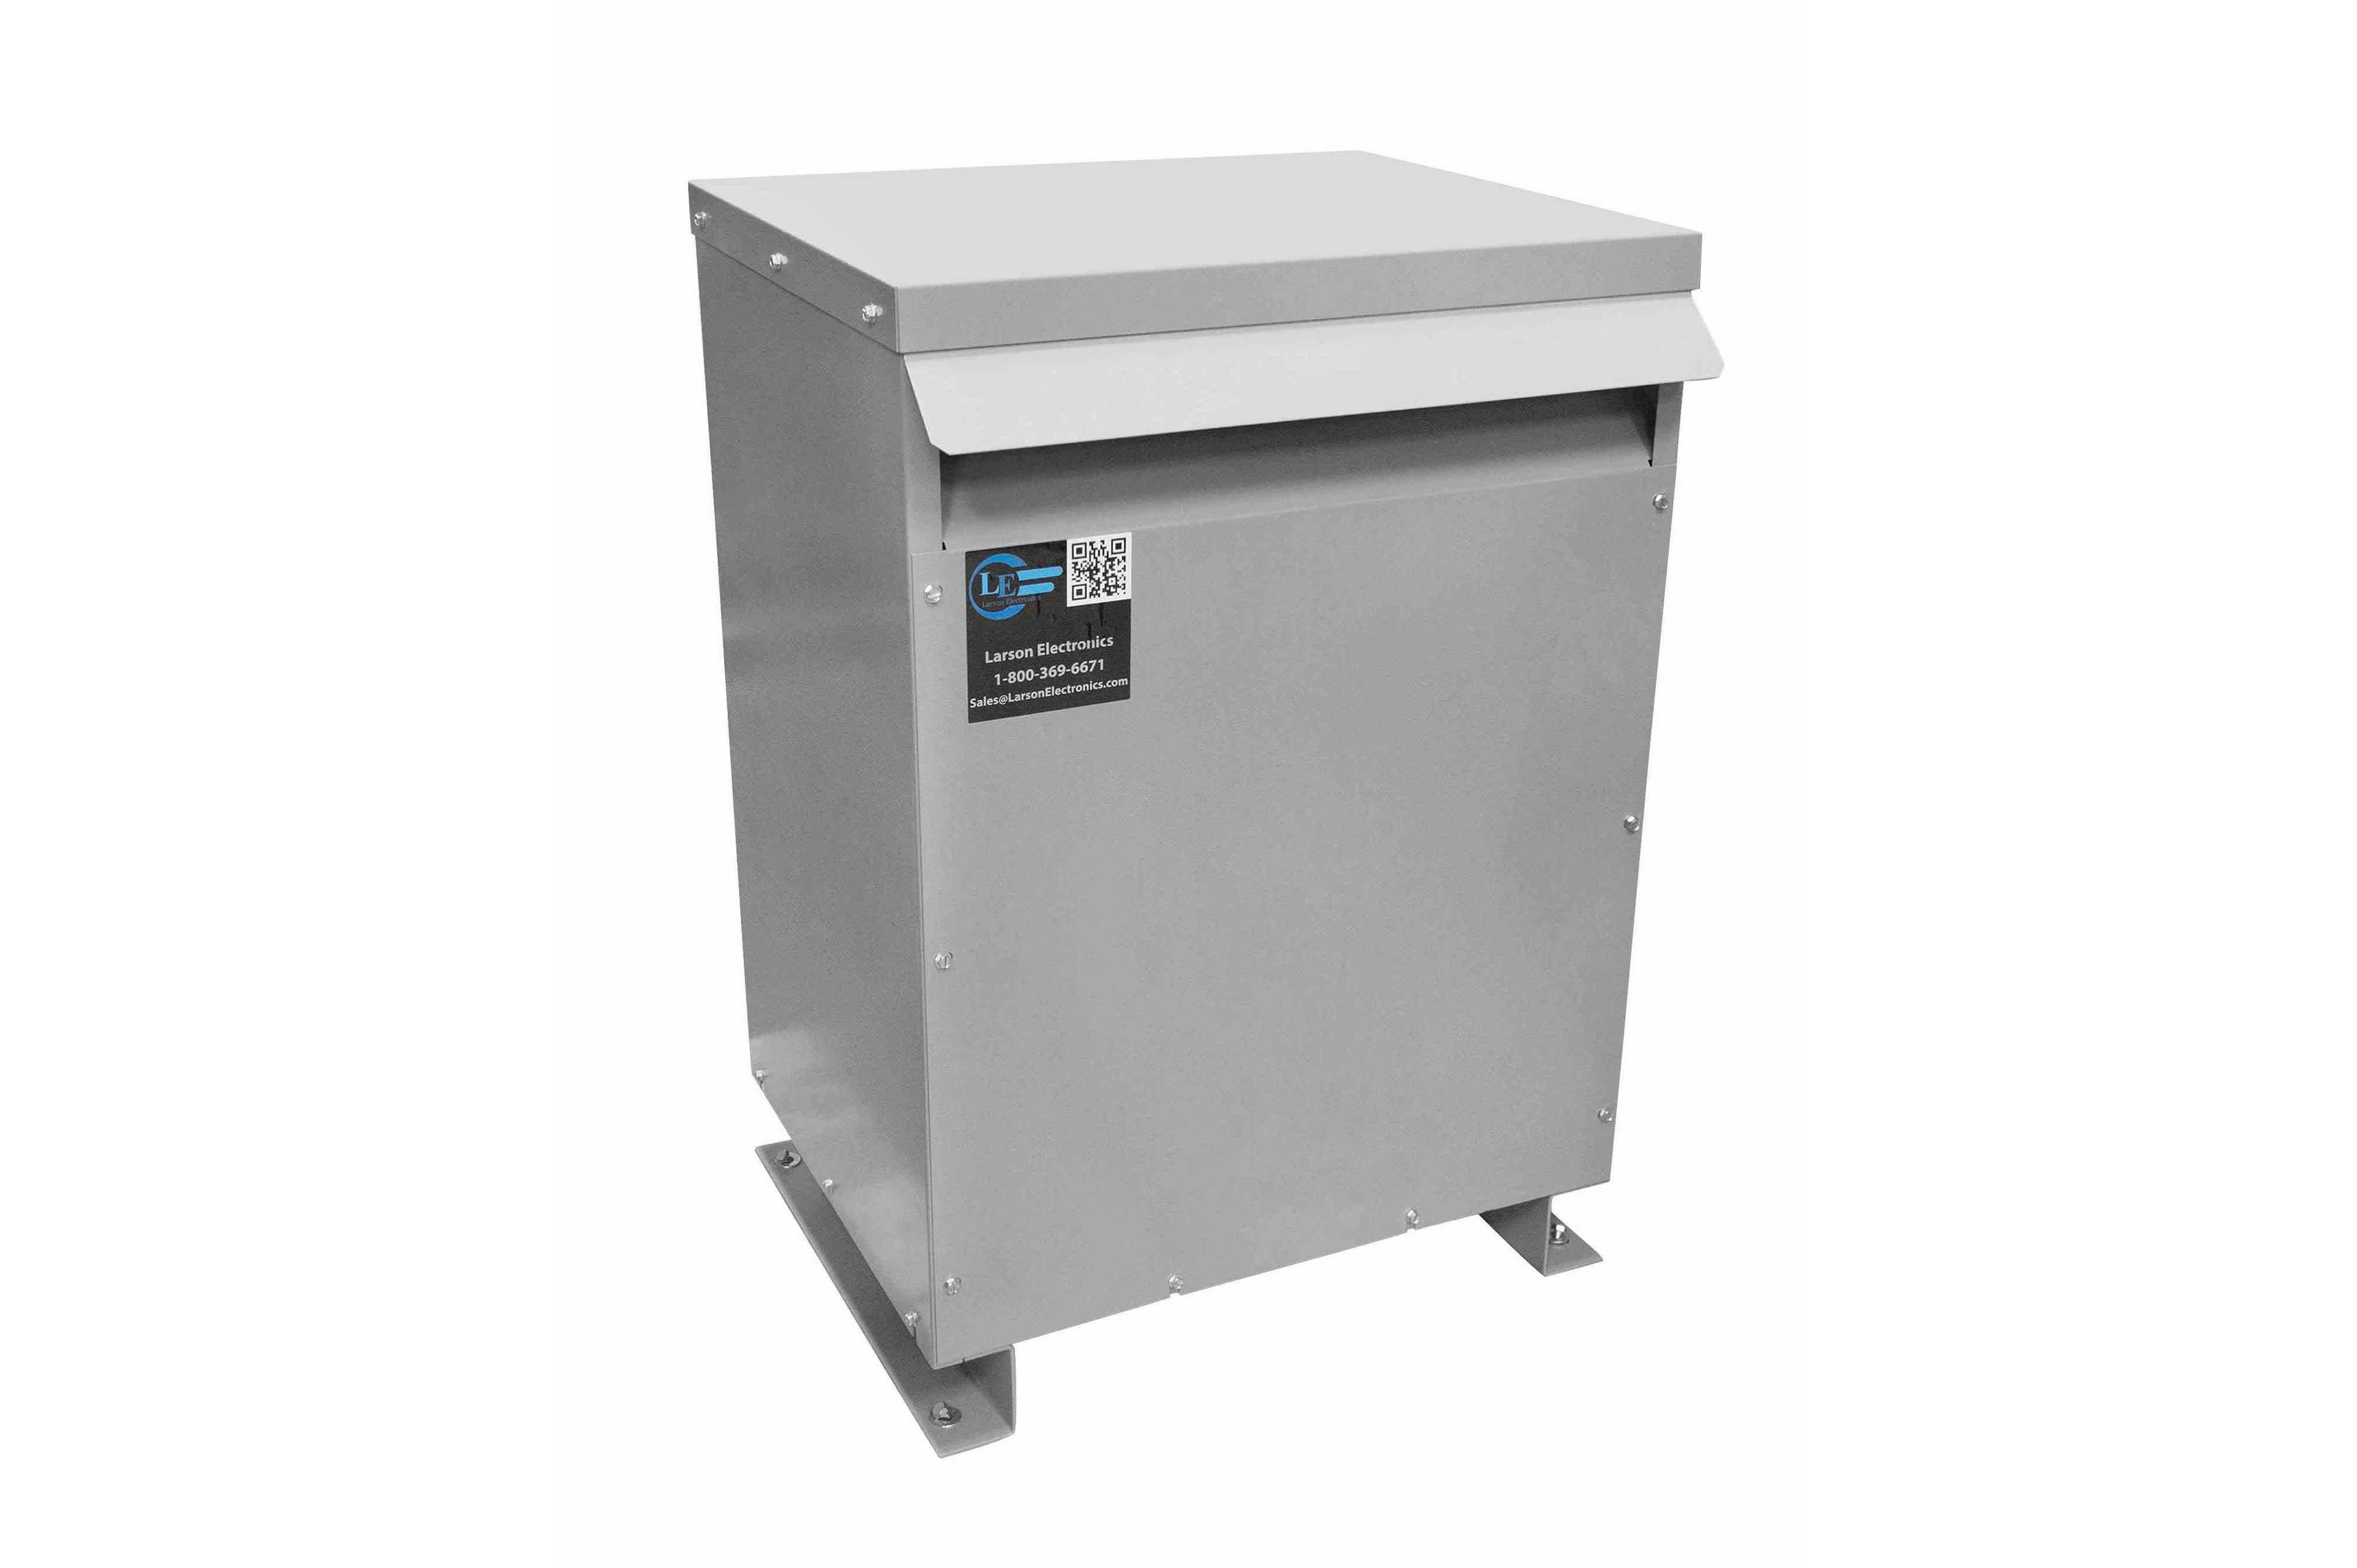 175 kVA 3PH Isolation Transformer, 380V Wye Primary, 480V Delta Secondary, N3R, Ventilated, 60 Hz